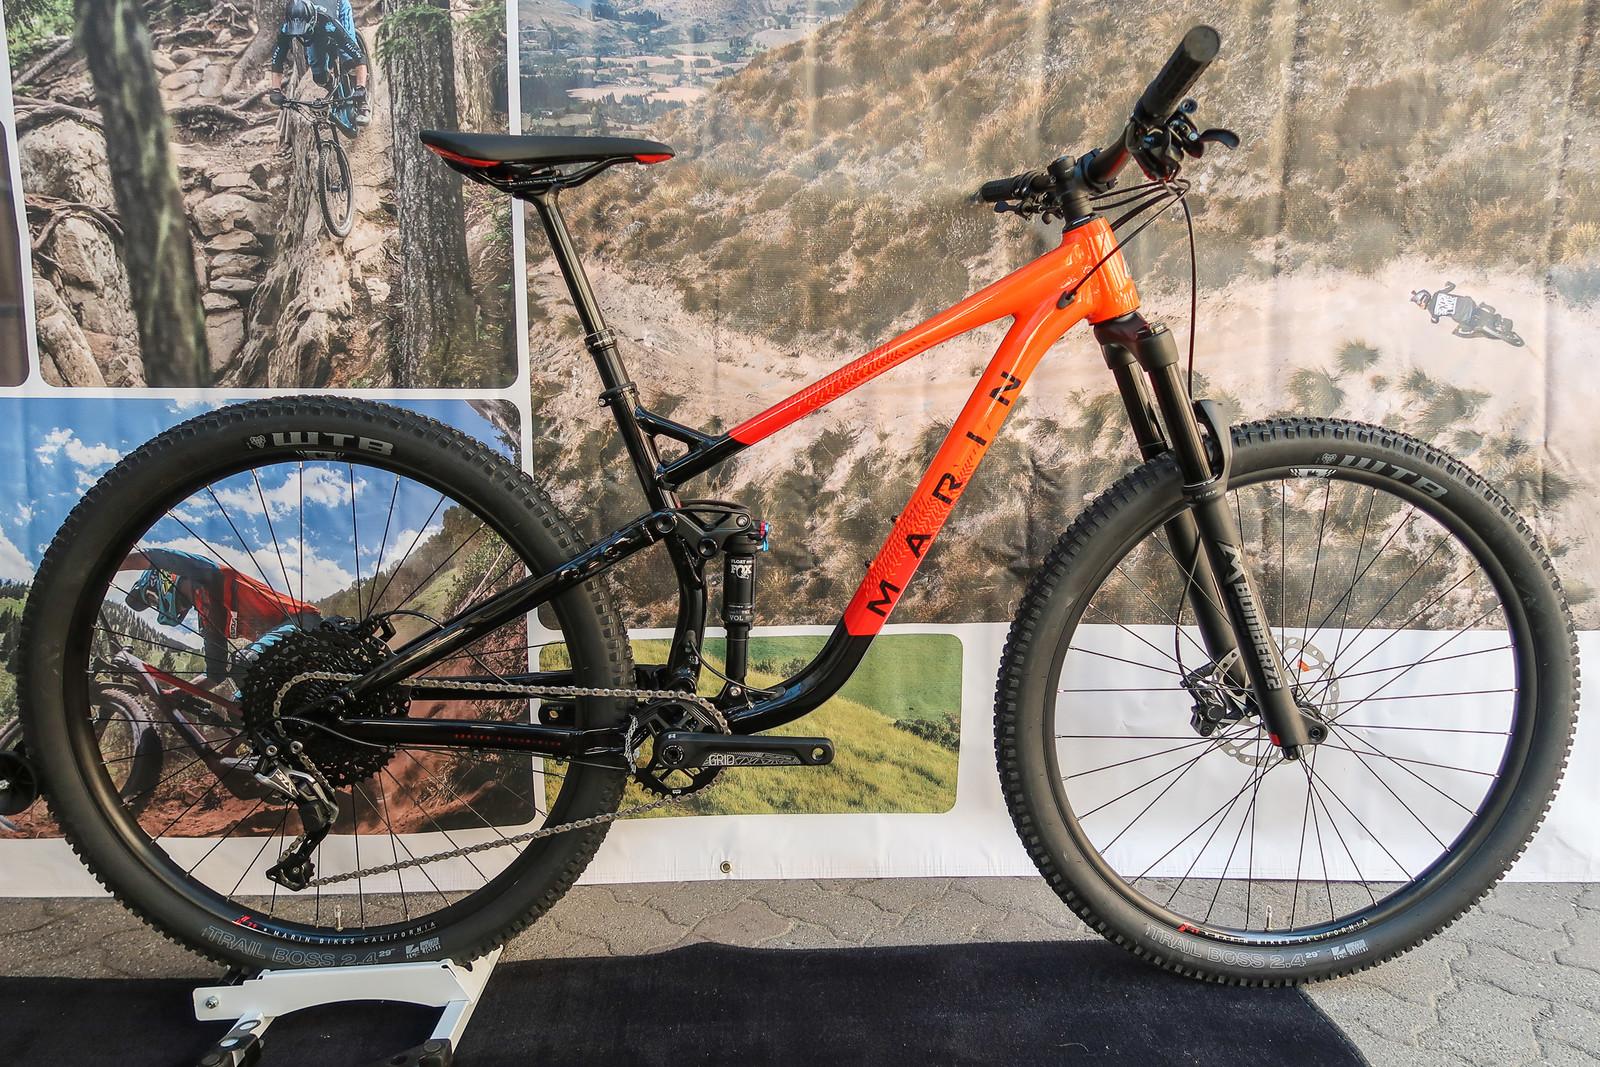 2020 Marin Rift Zone 3 Trail Bike - PIT BITS - 2019 Crankworx Whistler Bikes and Tech - Mountain Biking Pictures - Vital MTB